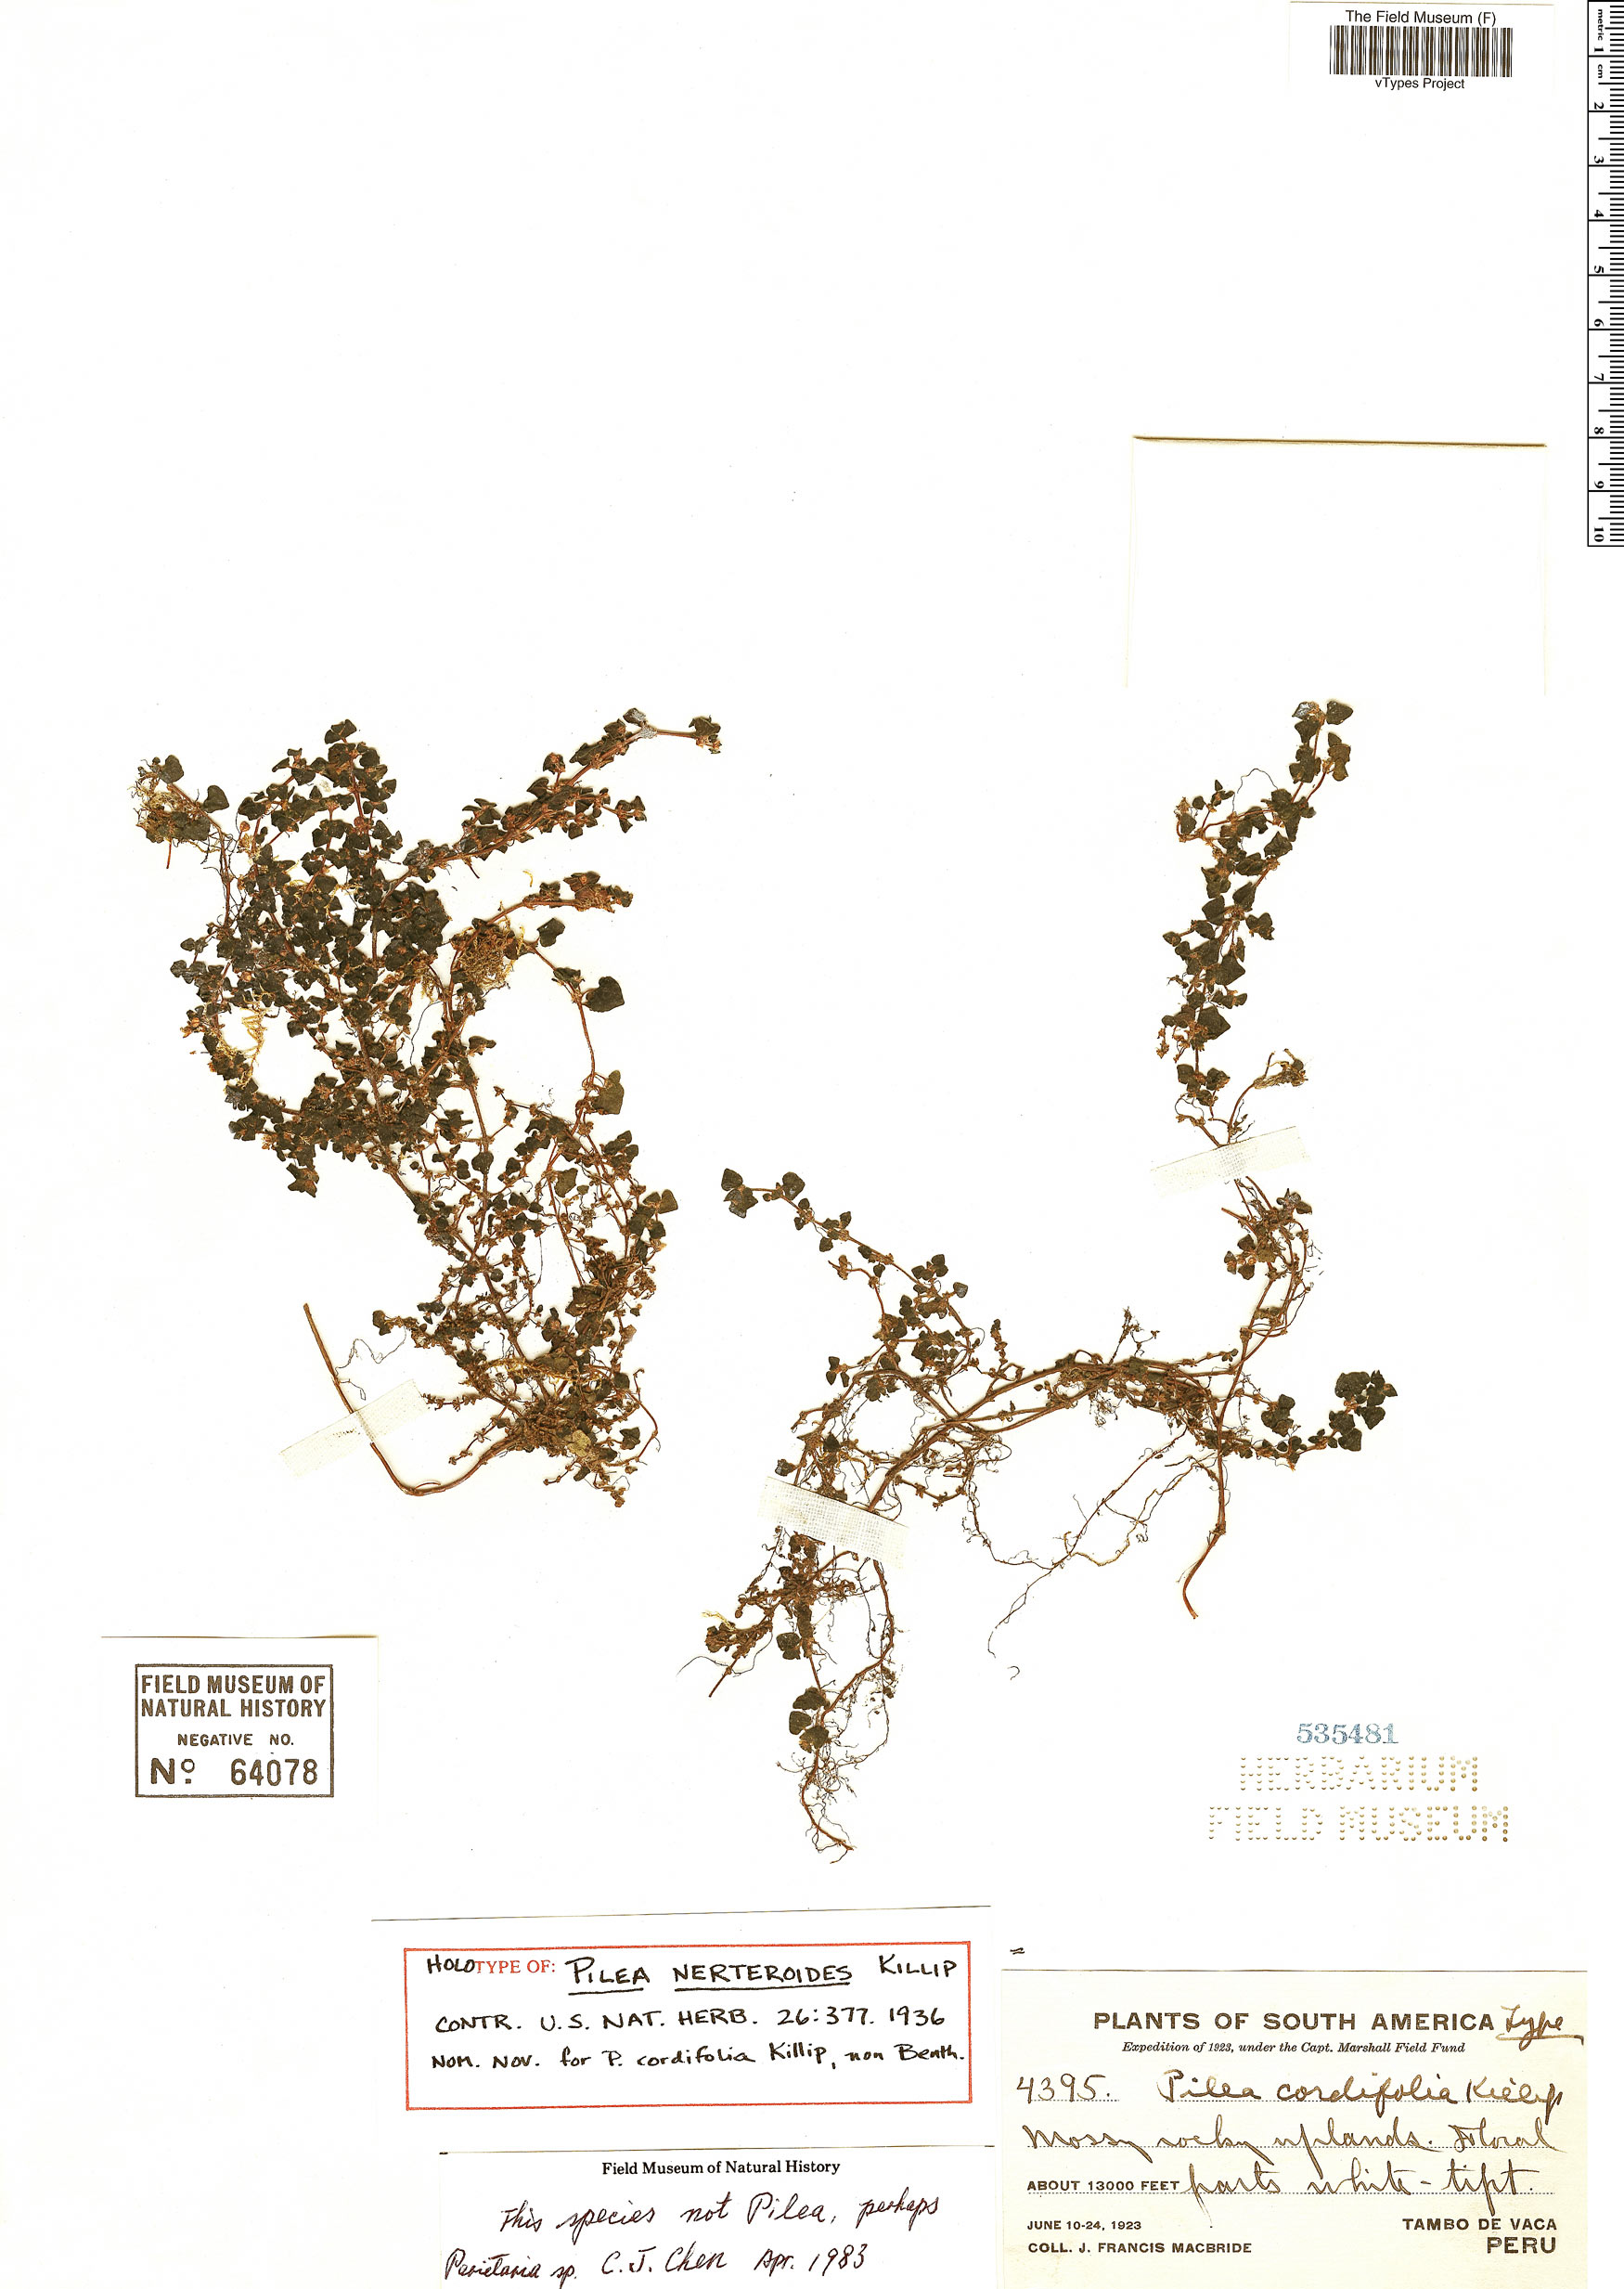 Specimen: Pilea nerteroides